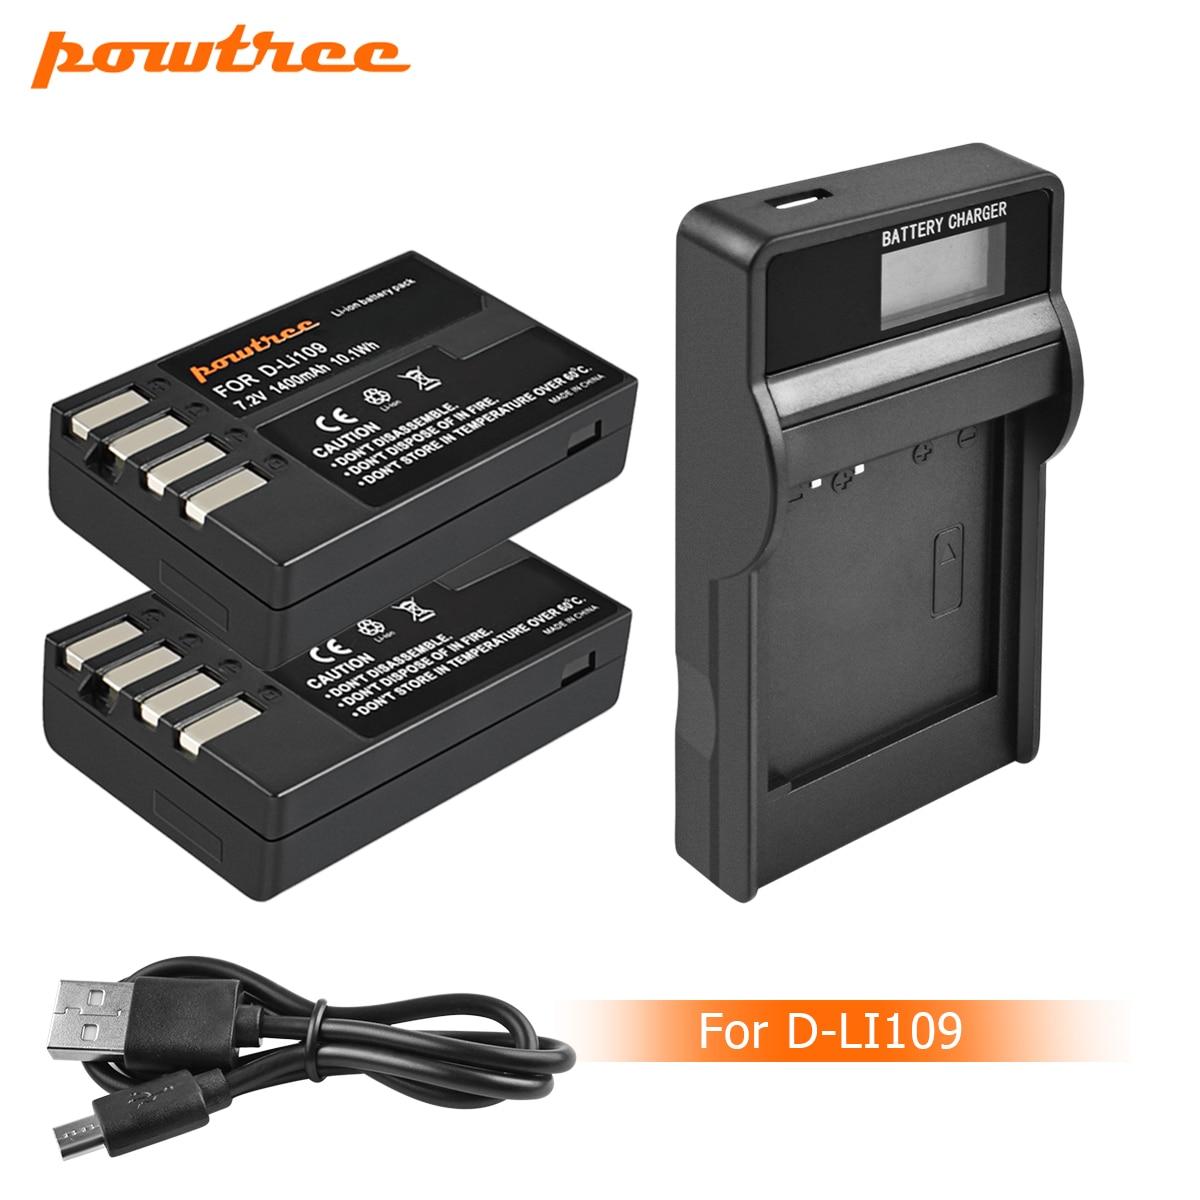 Powtree D Li109 DLi109 D-Li109 batería LCD + cargador para Pentax K-70 K70 K-50 K50 K-30 K30 K-S1 KS1 K-S2 KS2 K-r Kr L10